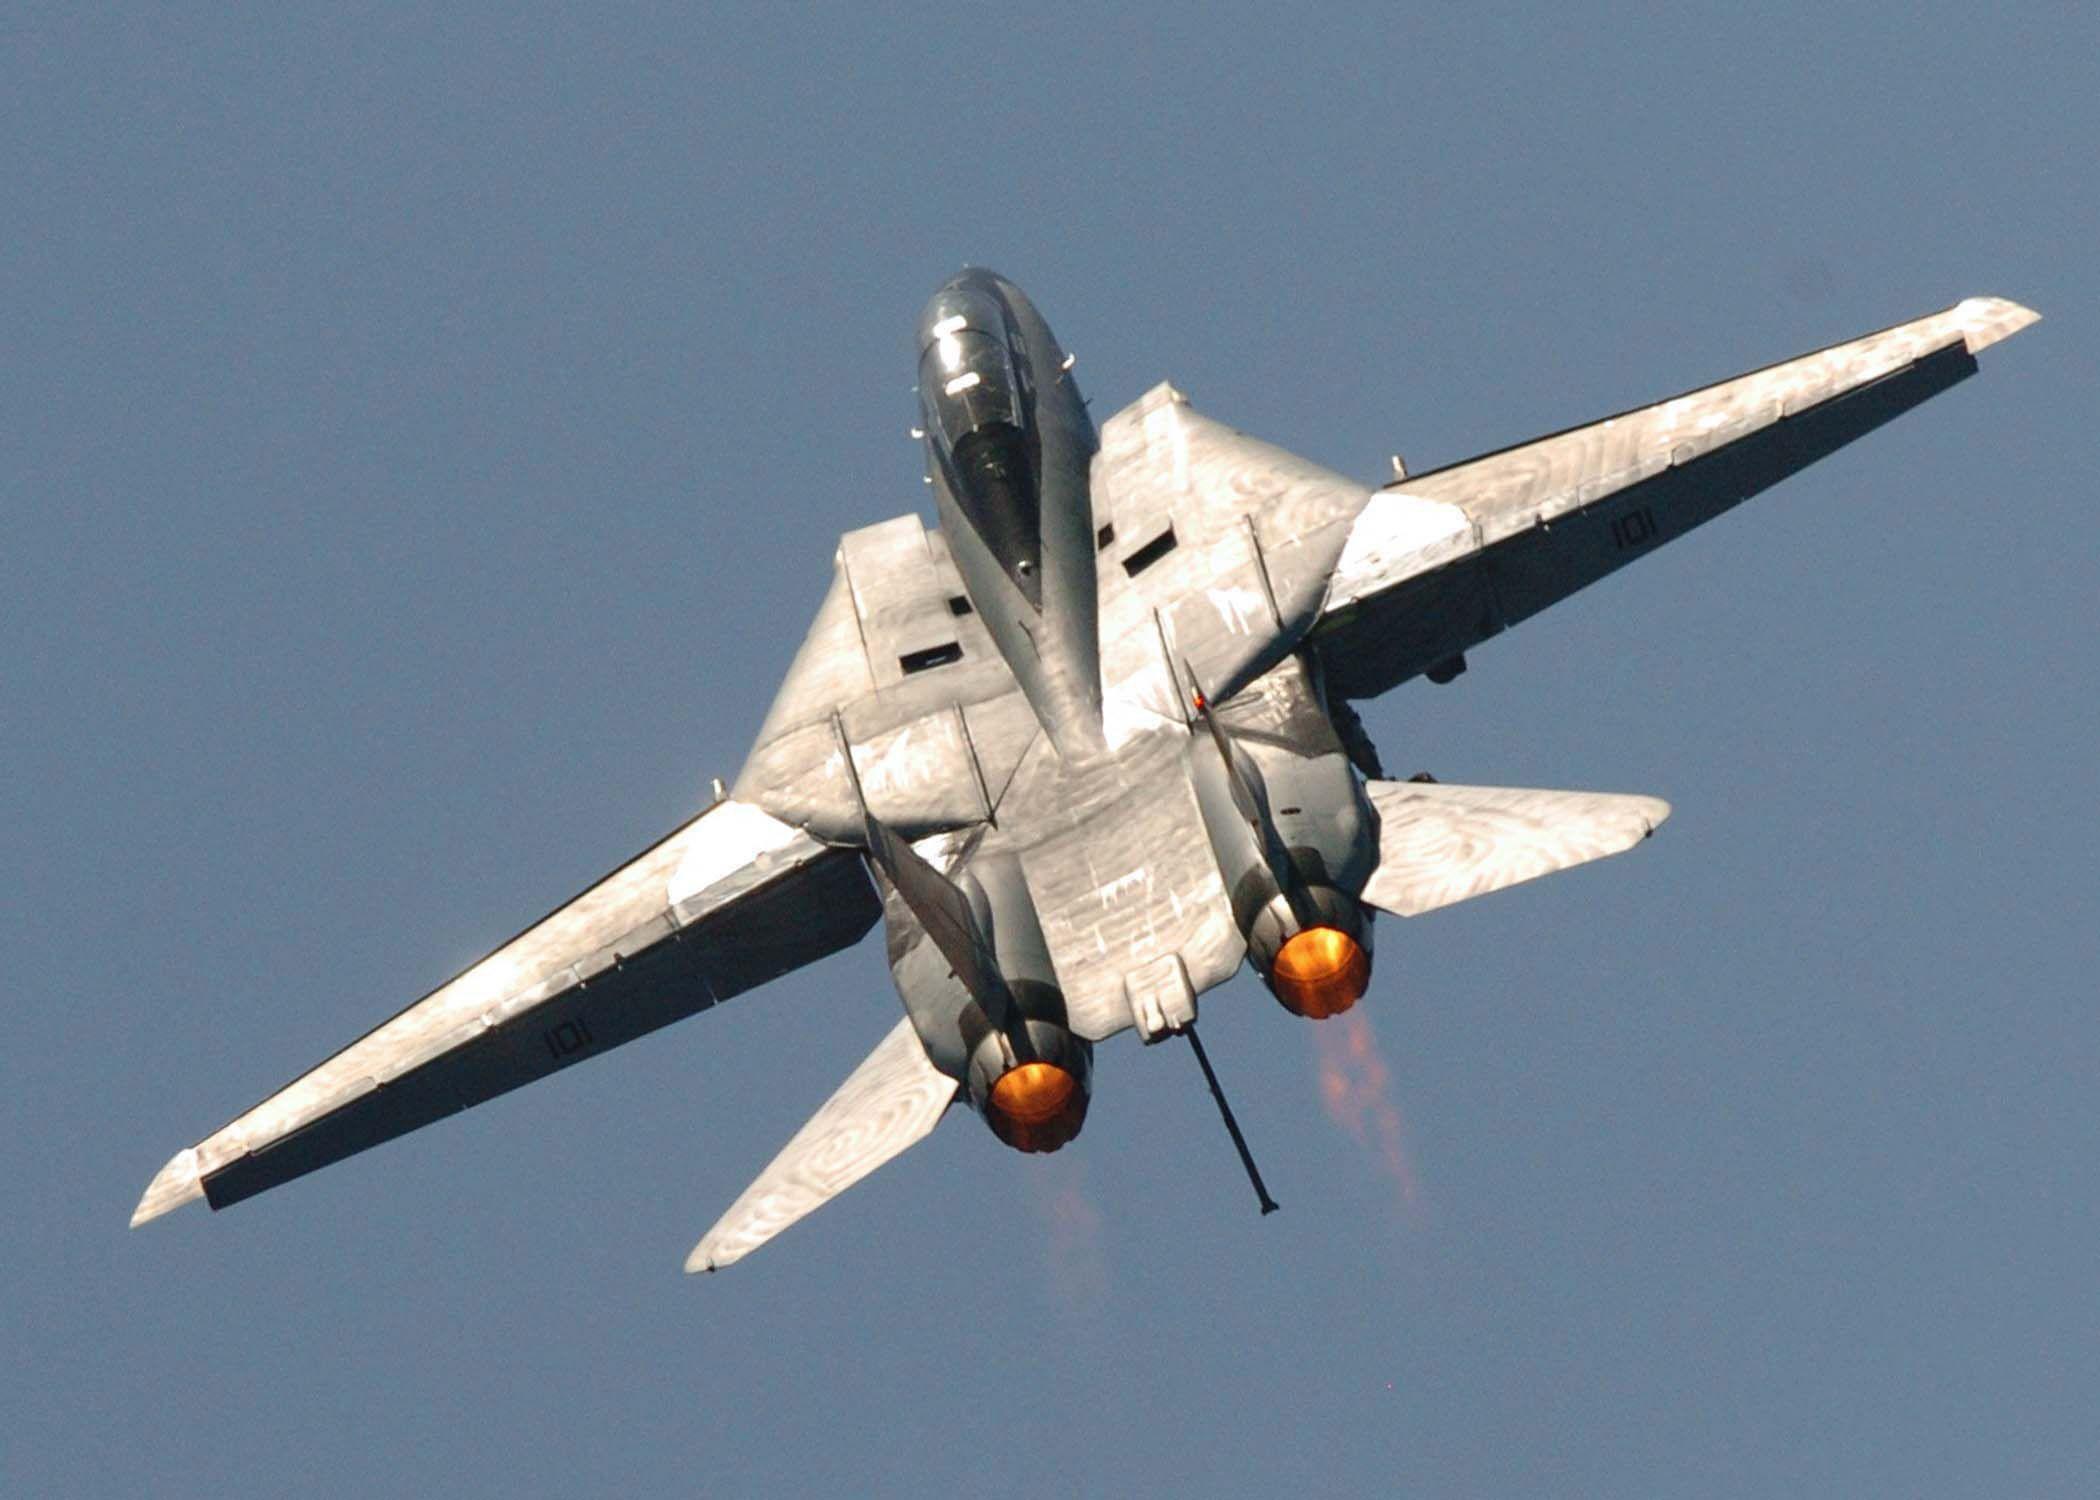 F 14 (戦闘機)の画像 p1_37